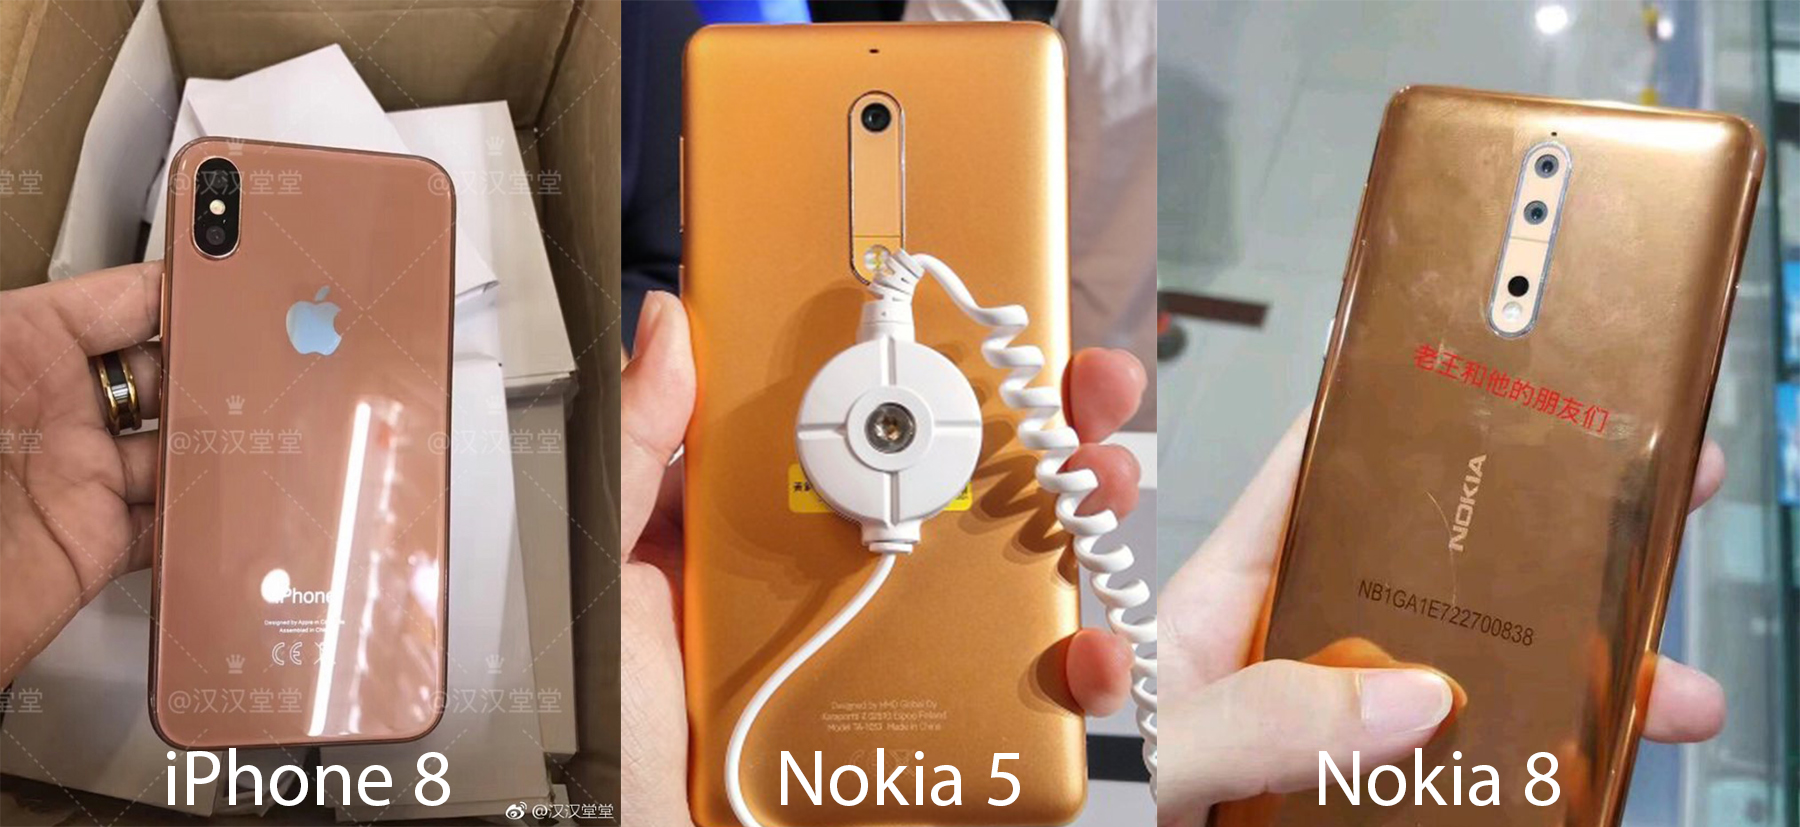 iphone 5s gold leak. copper-gold-hero-nokia-5-nokia-8-iphone-8.jpg iphone 5s gold leak \